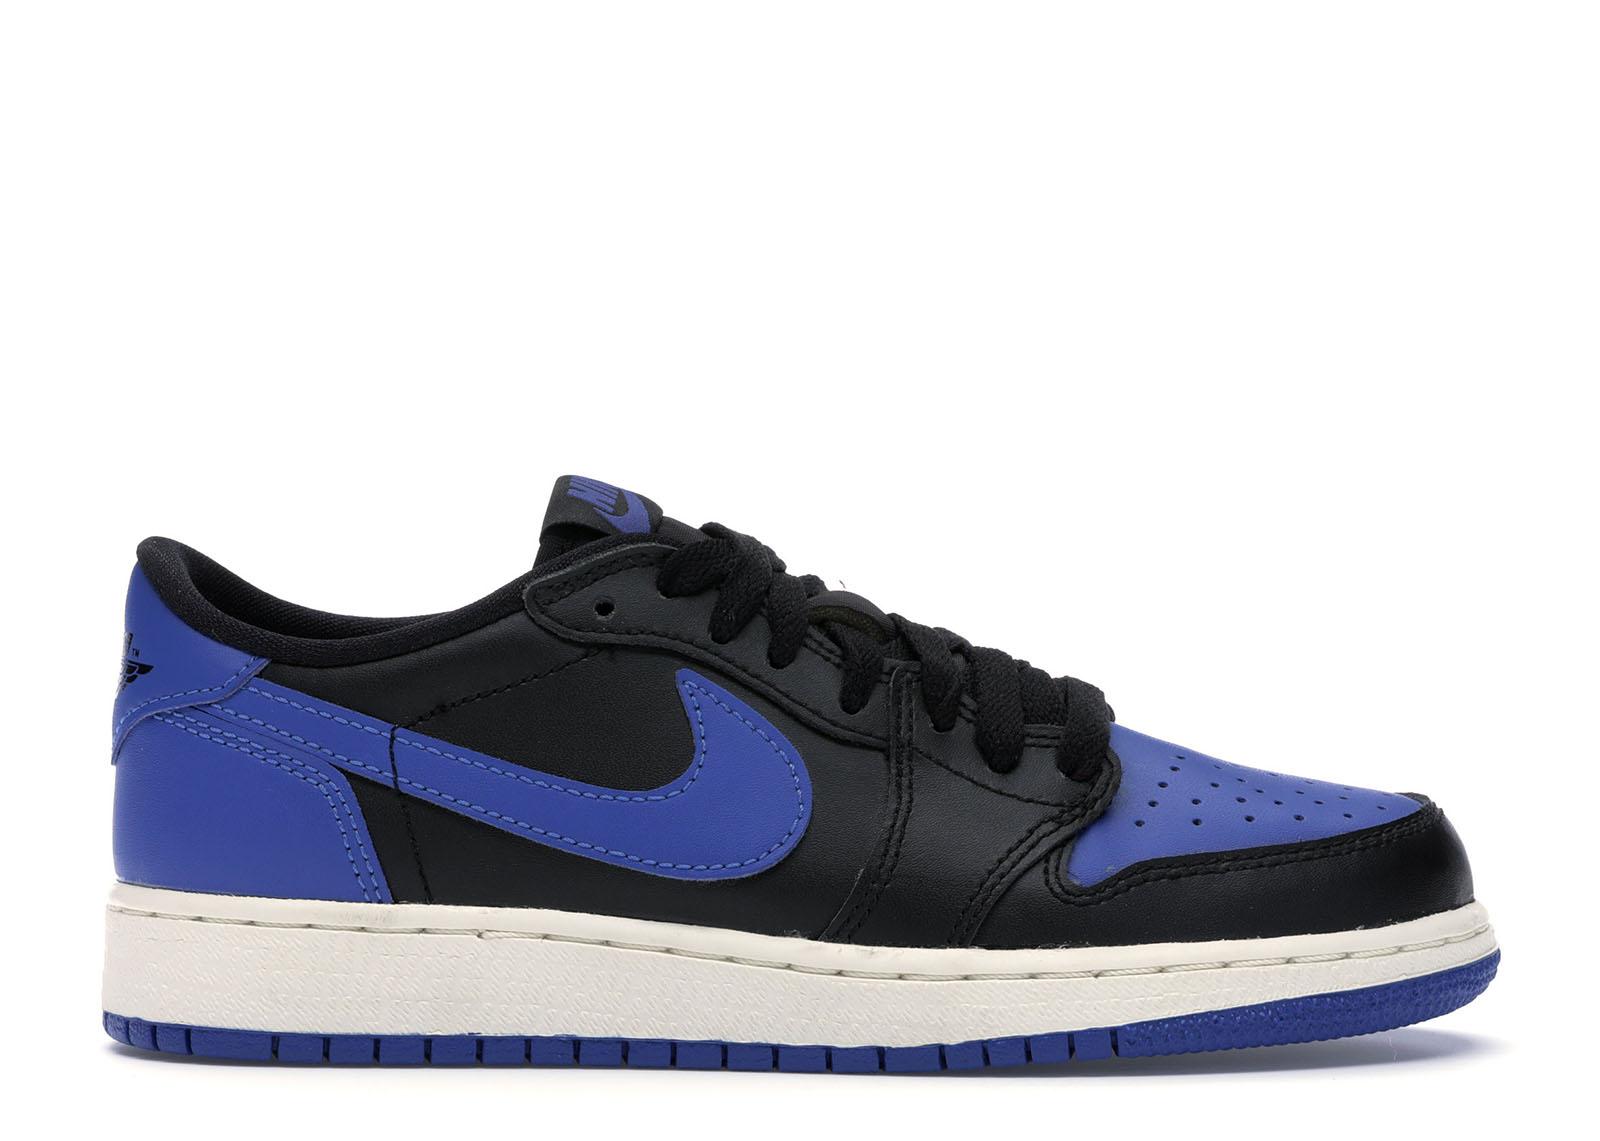 Jordan 1 Retro Low Royal Blue (GS)